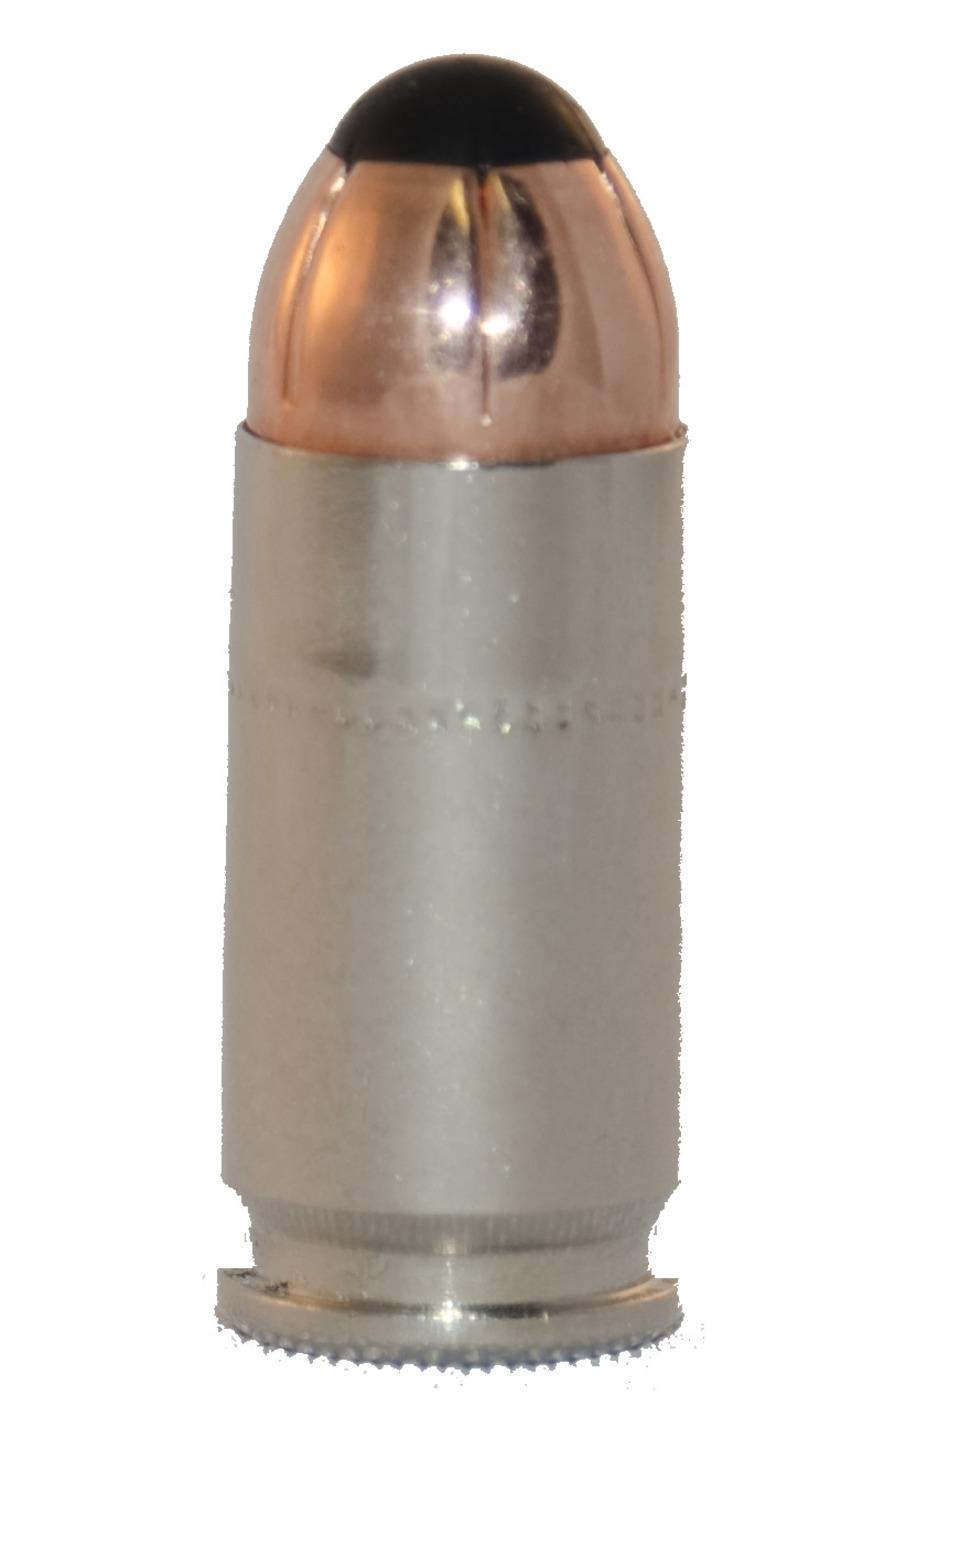 CORBON / Glaser Urban Response Pistol Ammunition - 9mm in